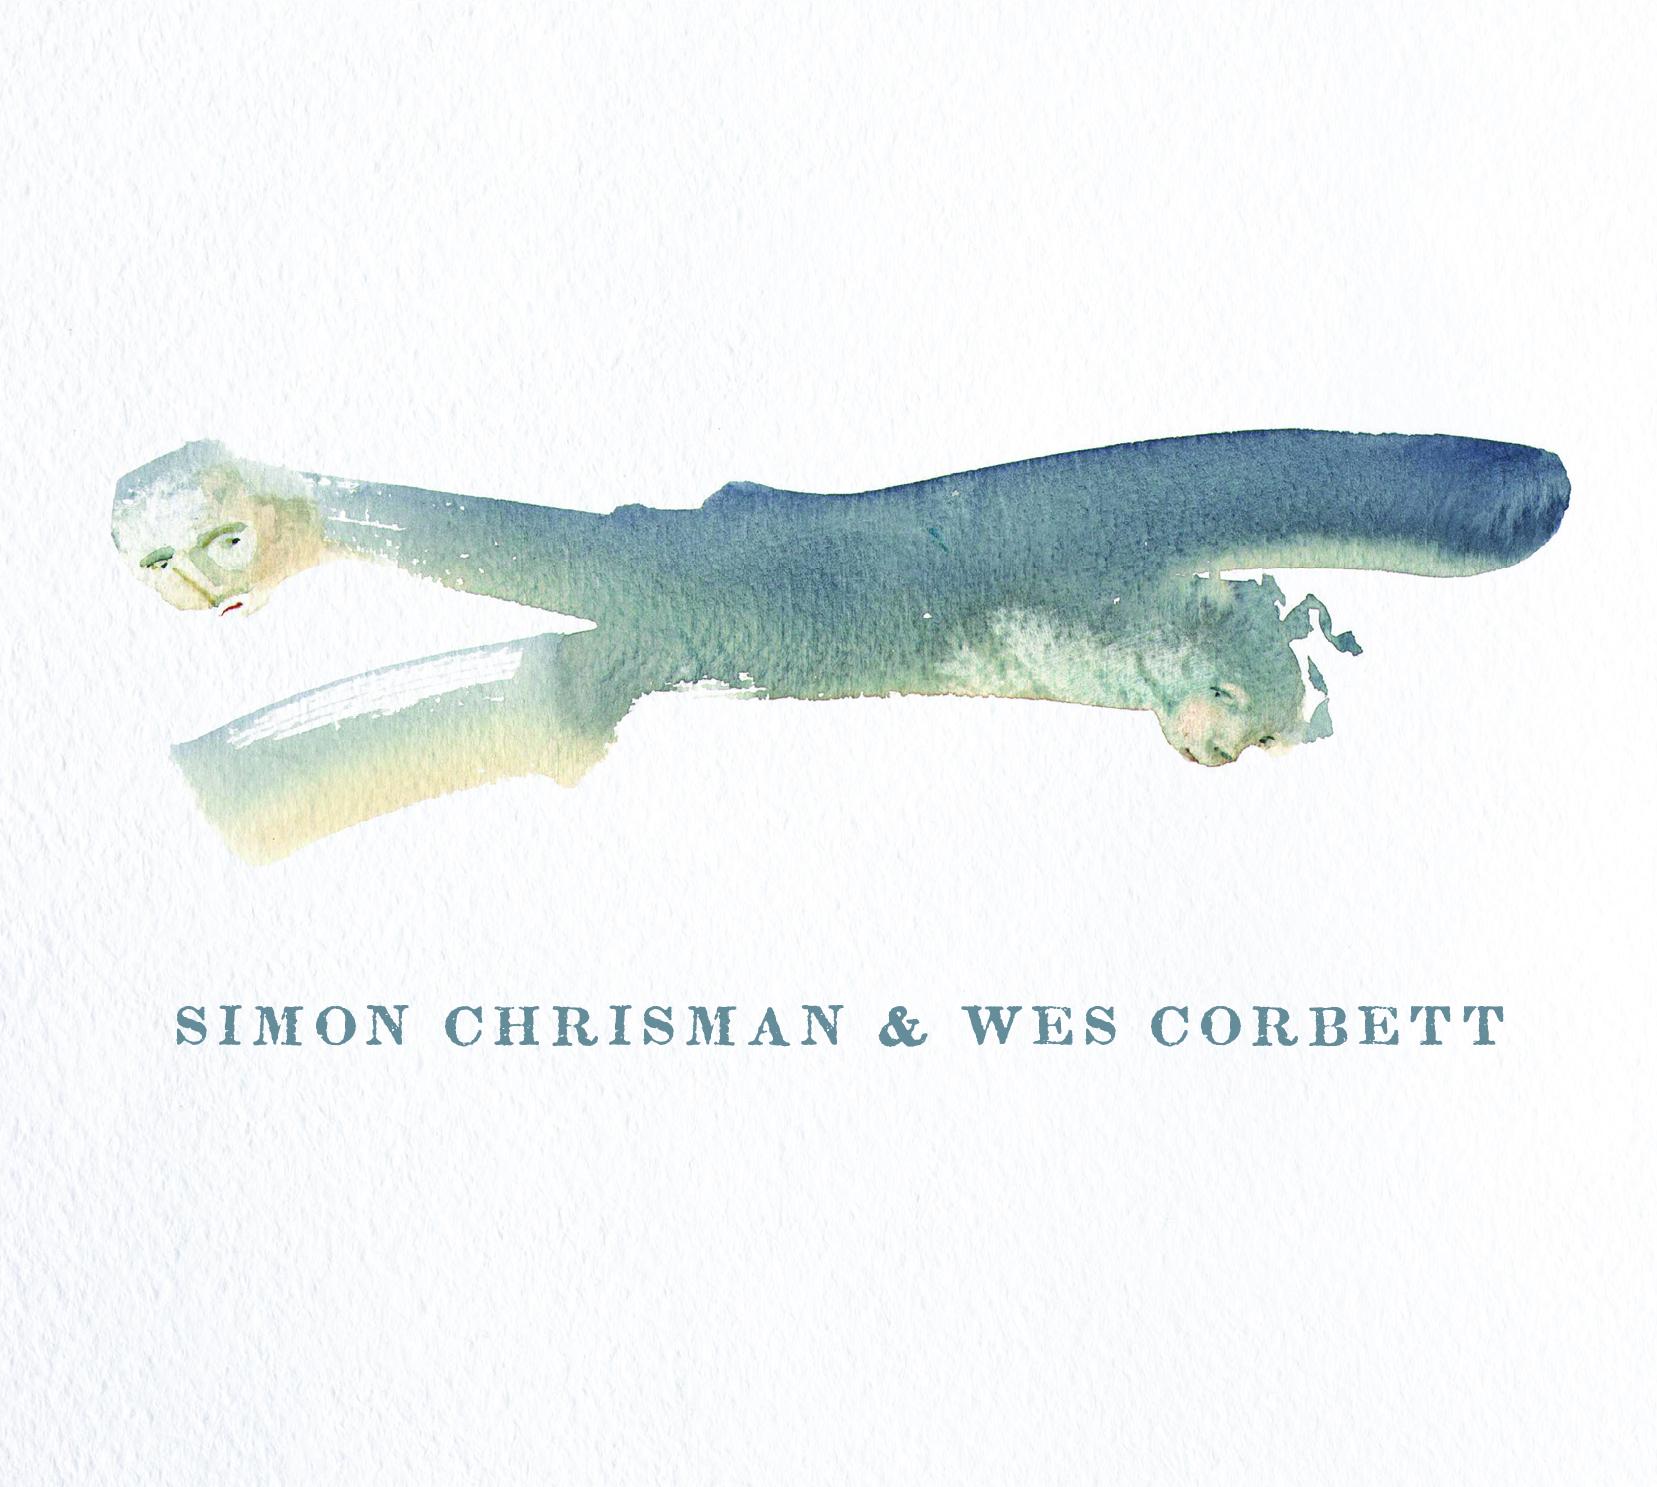 Simon Chrisman & Wes Corbett, 'Jane's Reel'